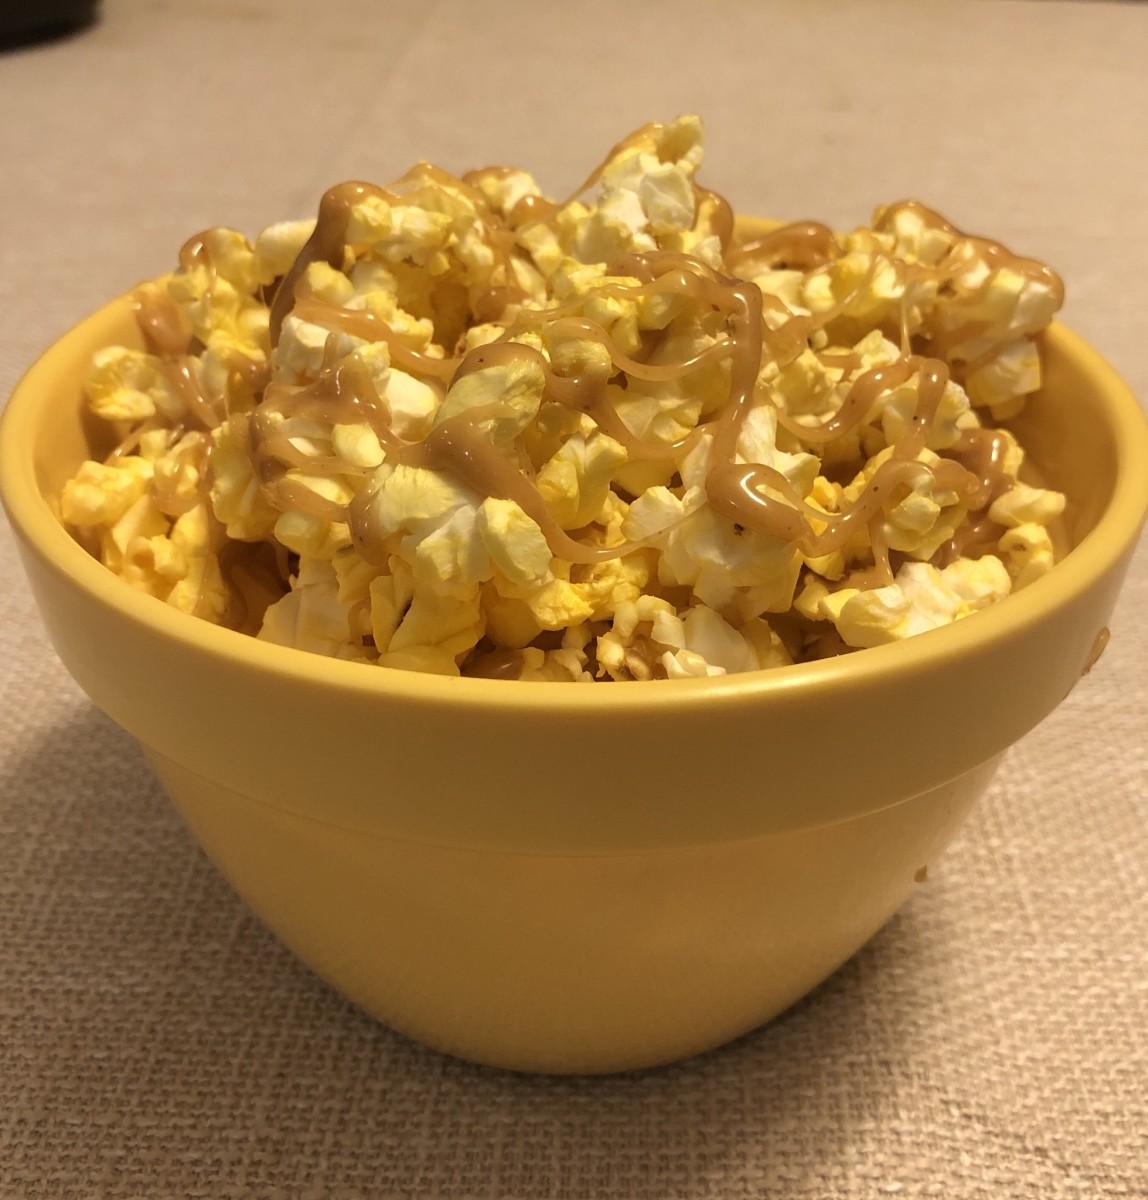 Peanut Butter Caramel Popcorn: A Party Snack Recipe